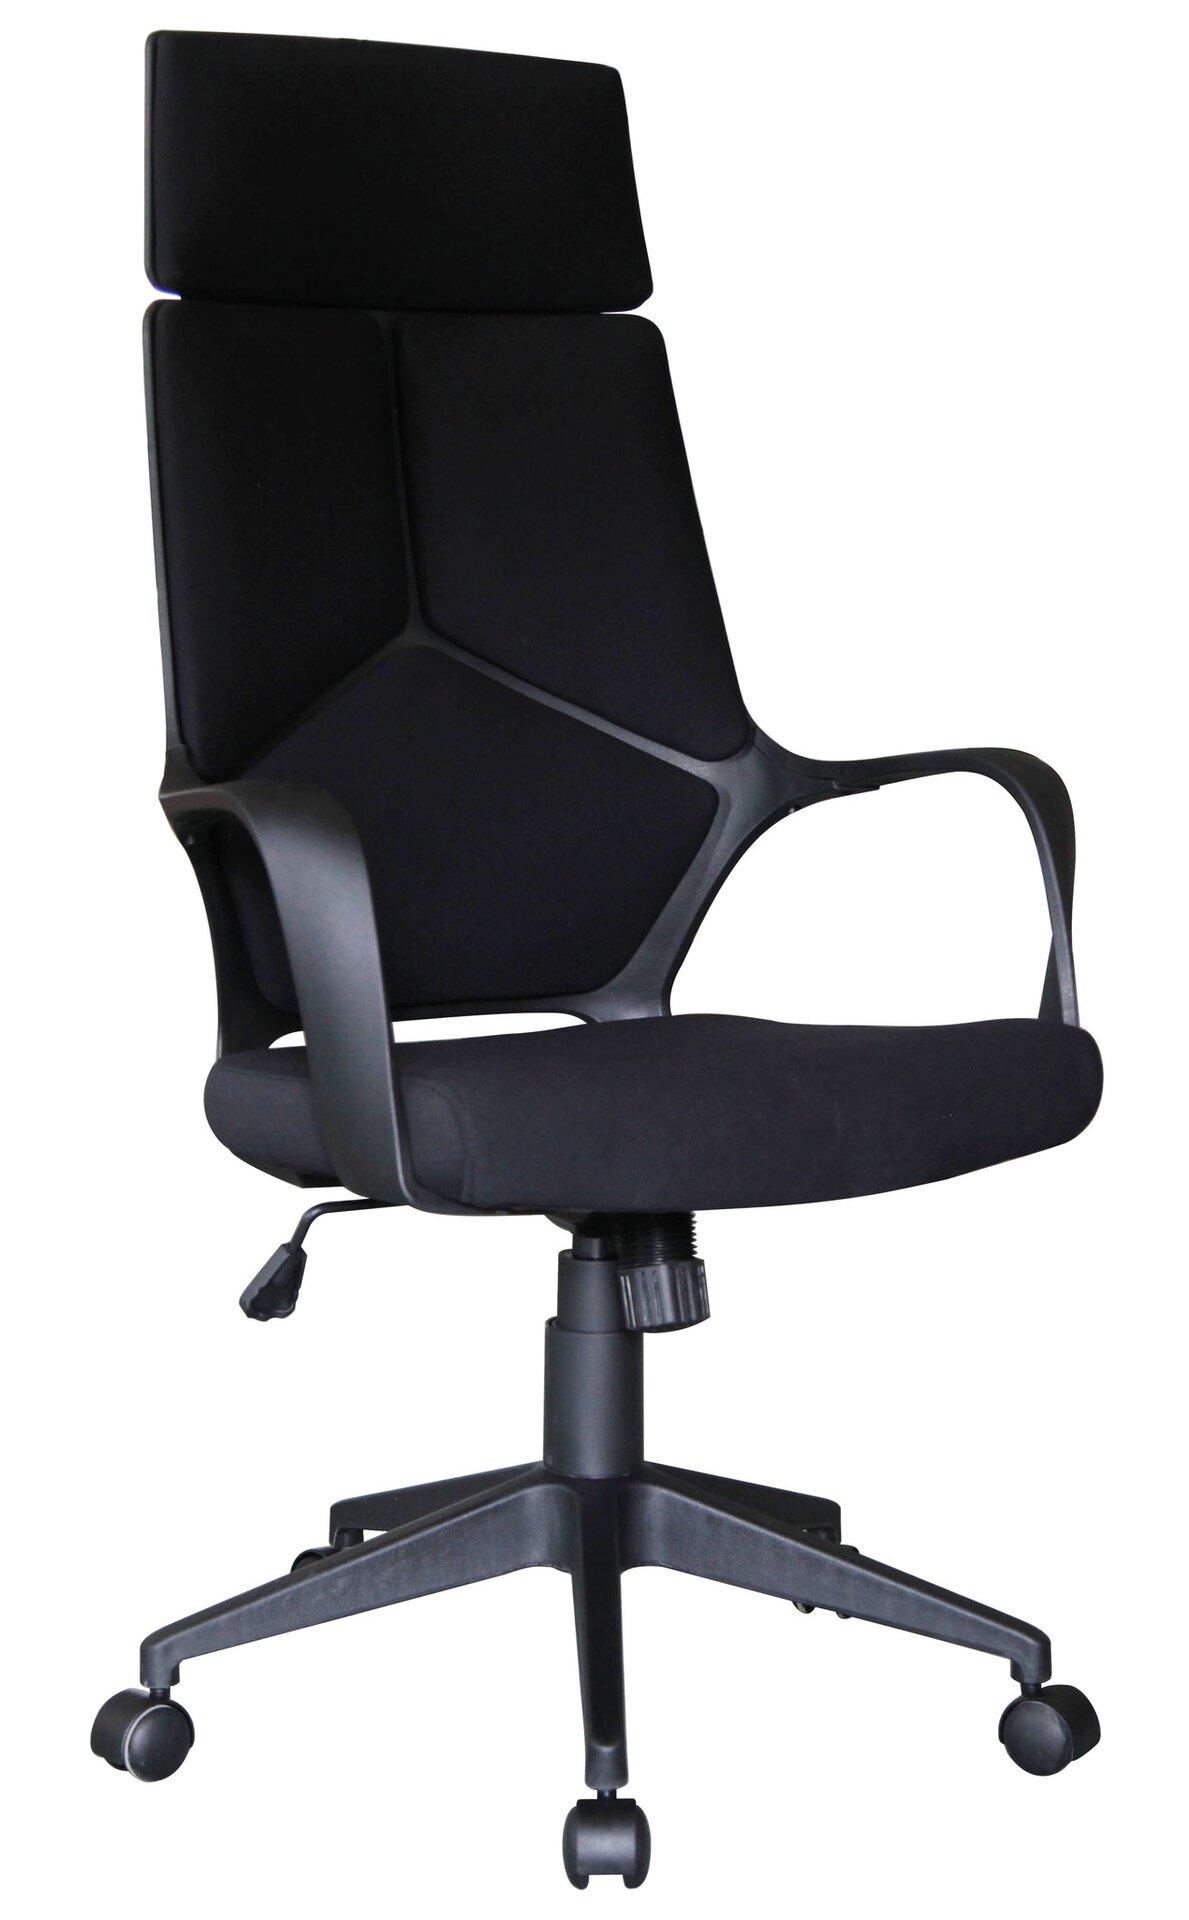 Chefsessel NEPTUN CELECT Textil schwarz 1 x 1 x 1 cm